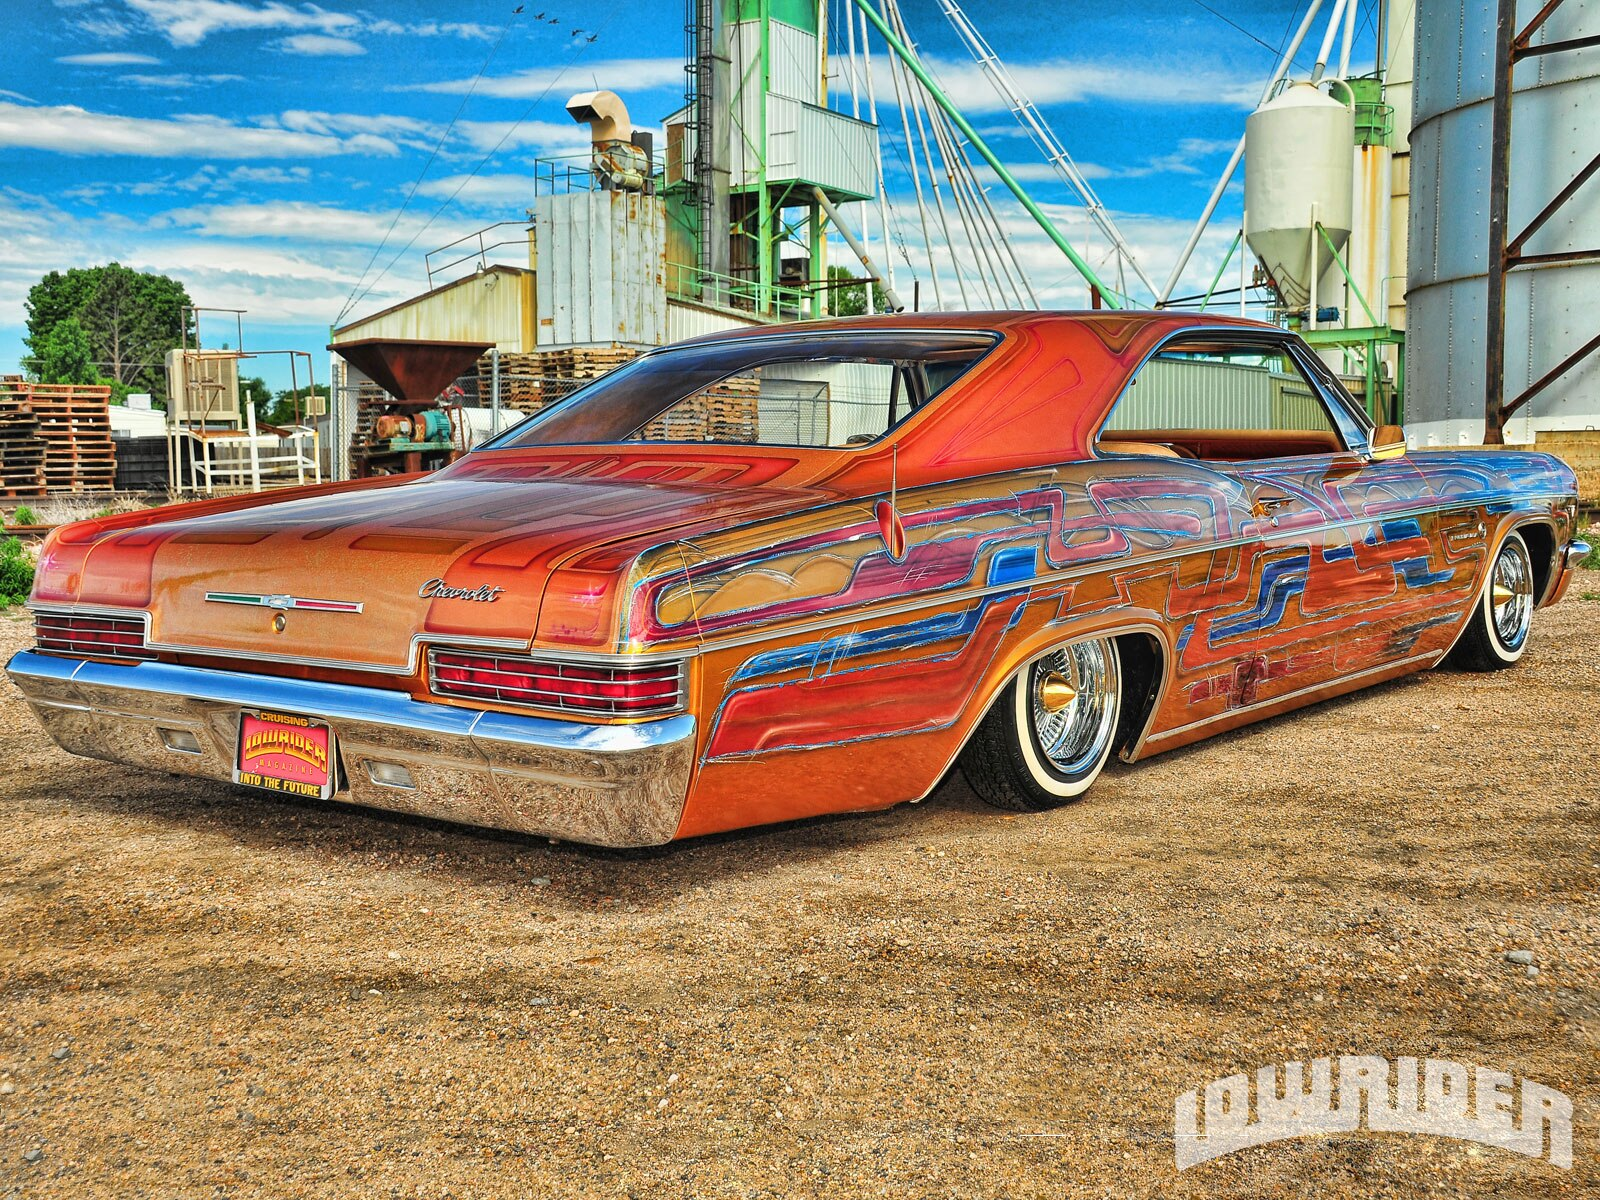 1210-lrmp-01-o-1966-chevrolet-impala-passenger-side-rear-quarter-view1